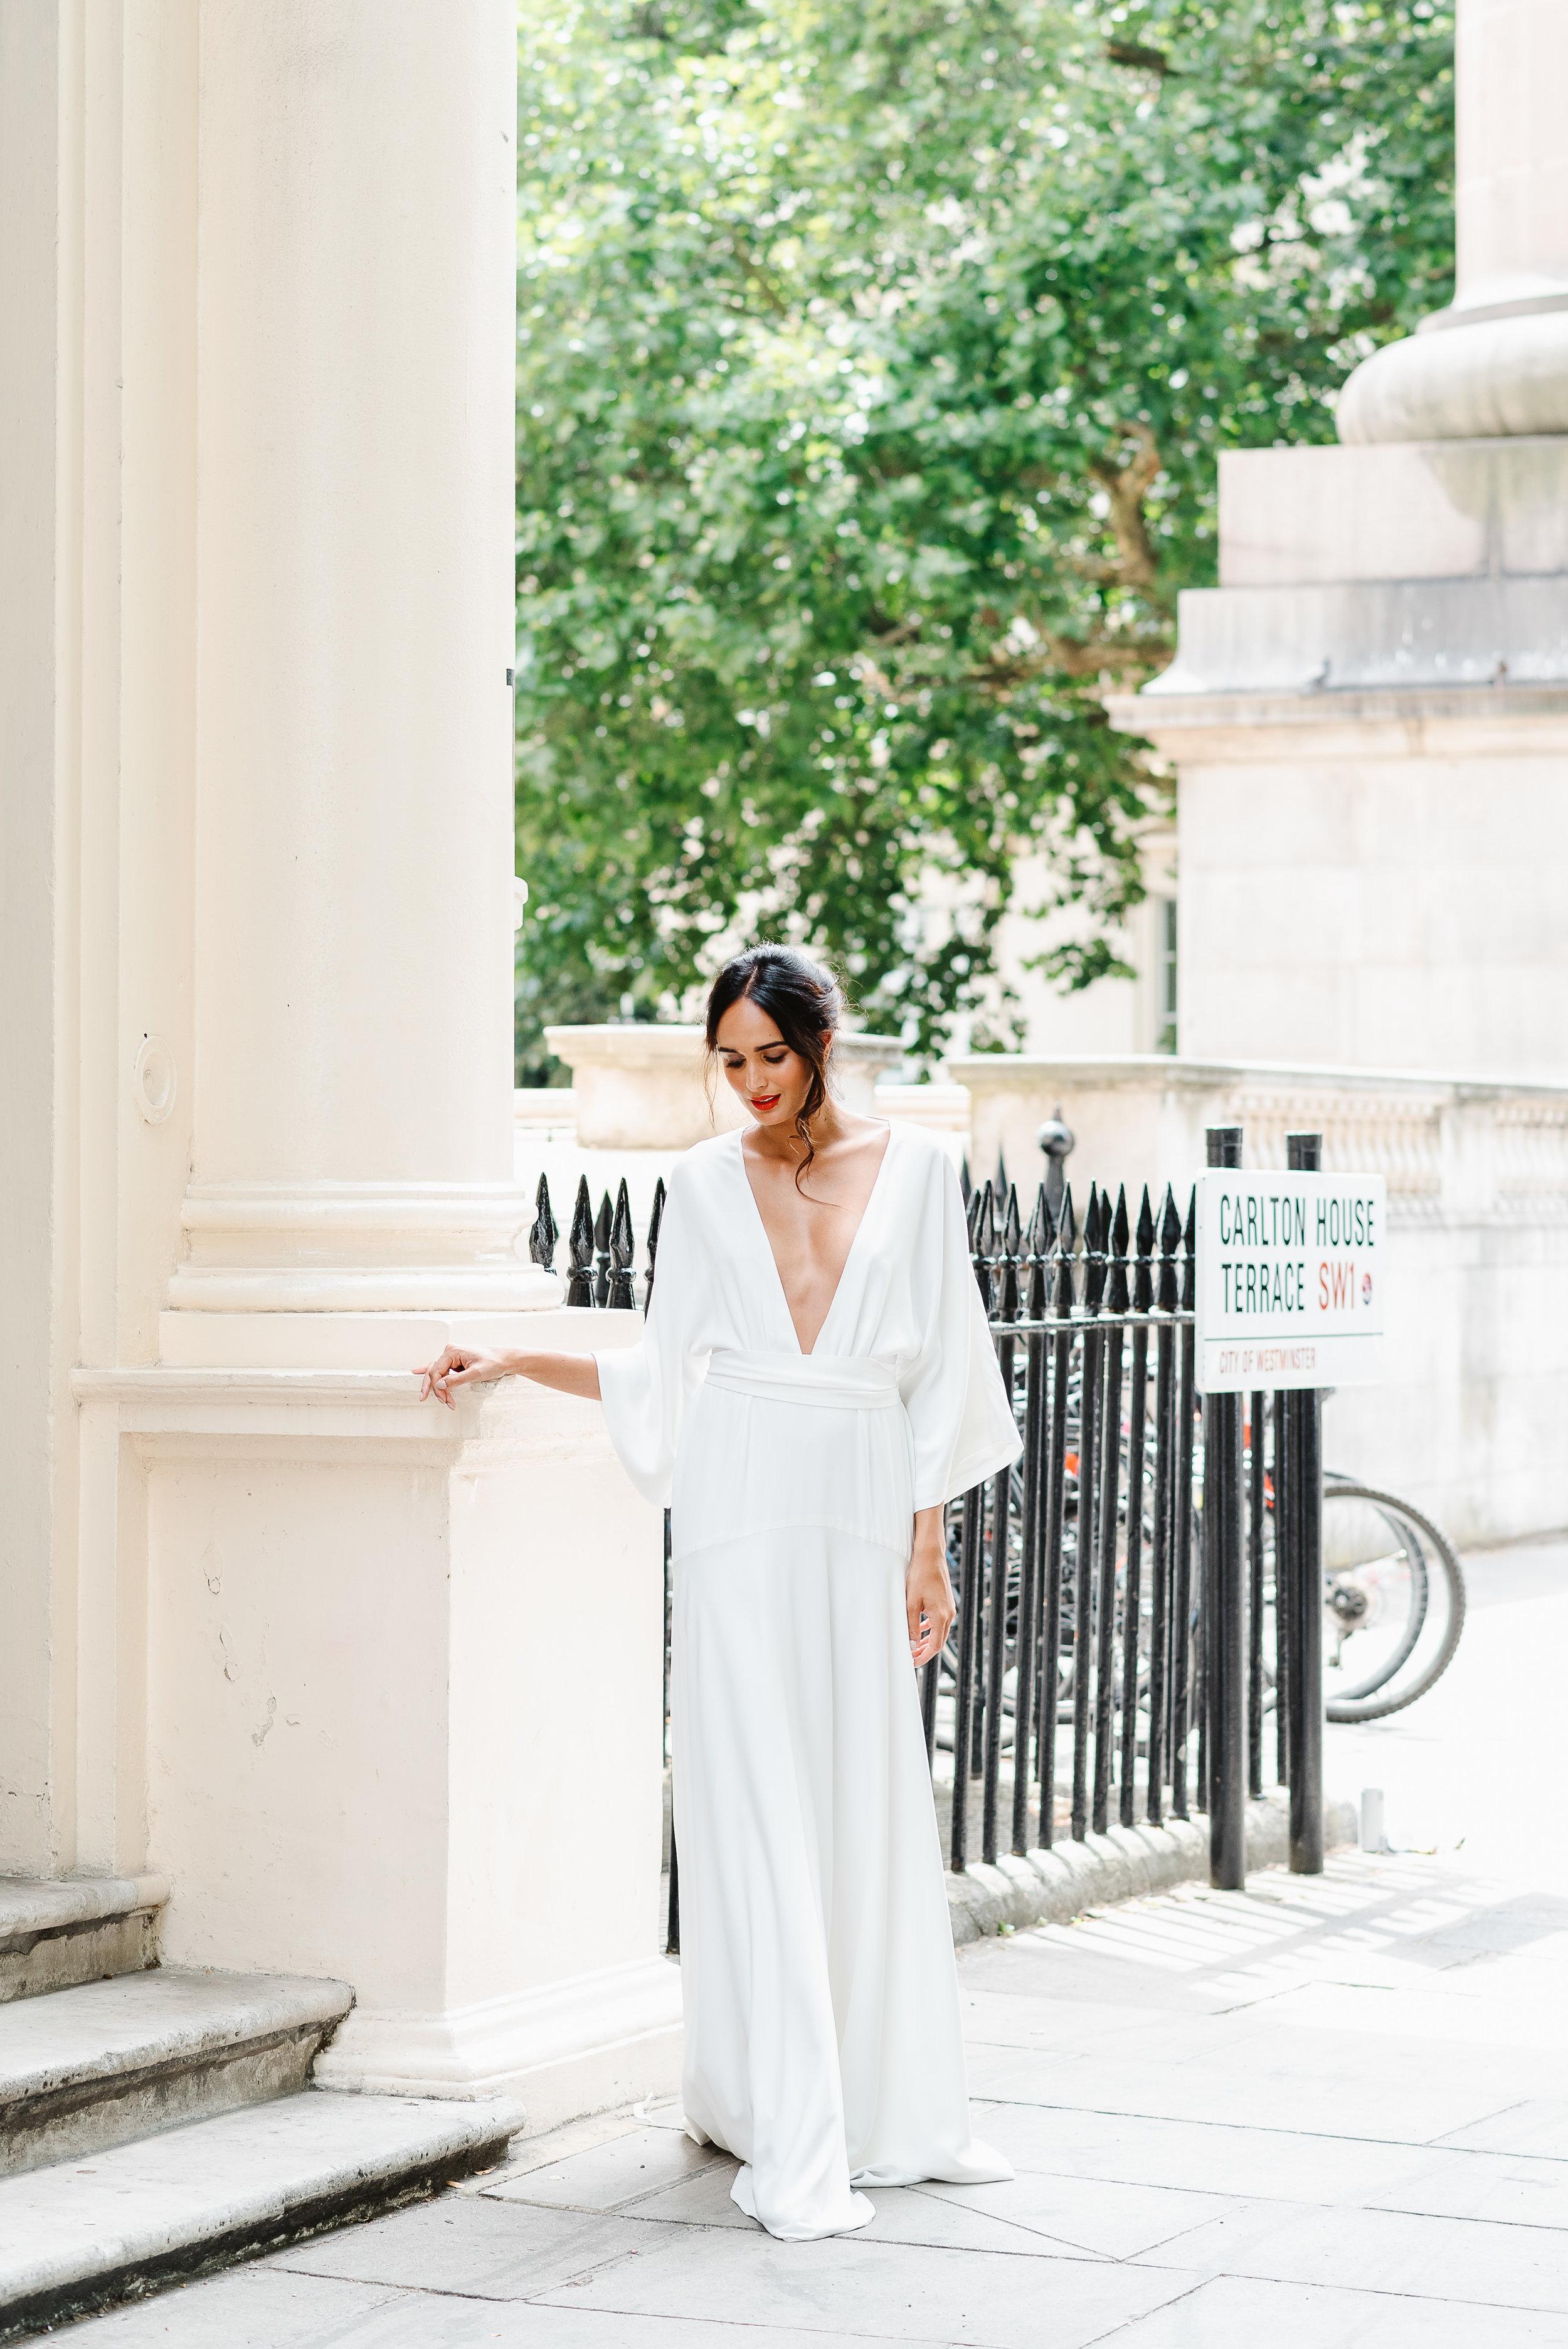 Revelry Events Carlton House London Bride Cool Wedding 00026.jpg